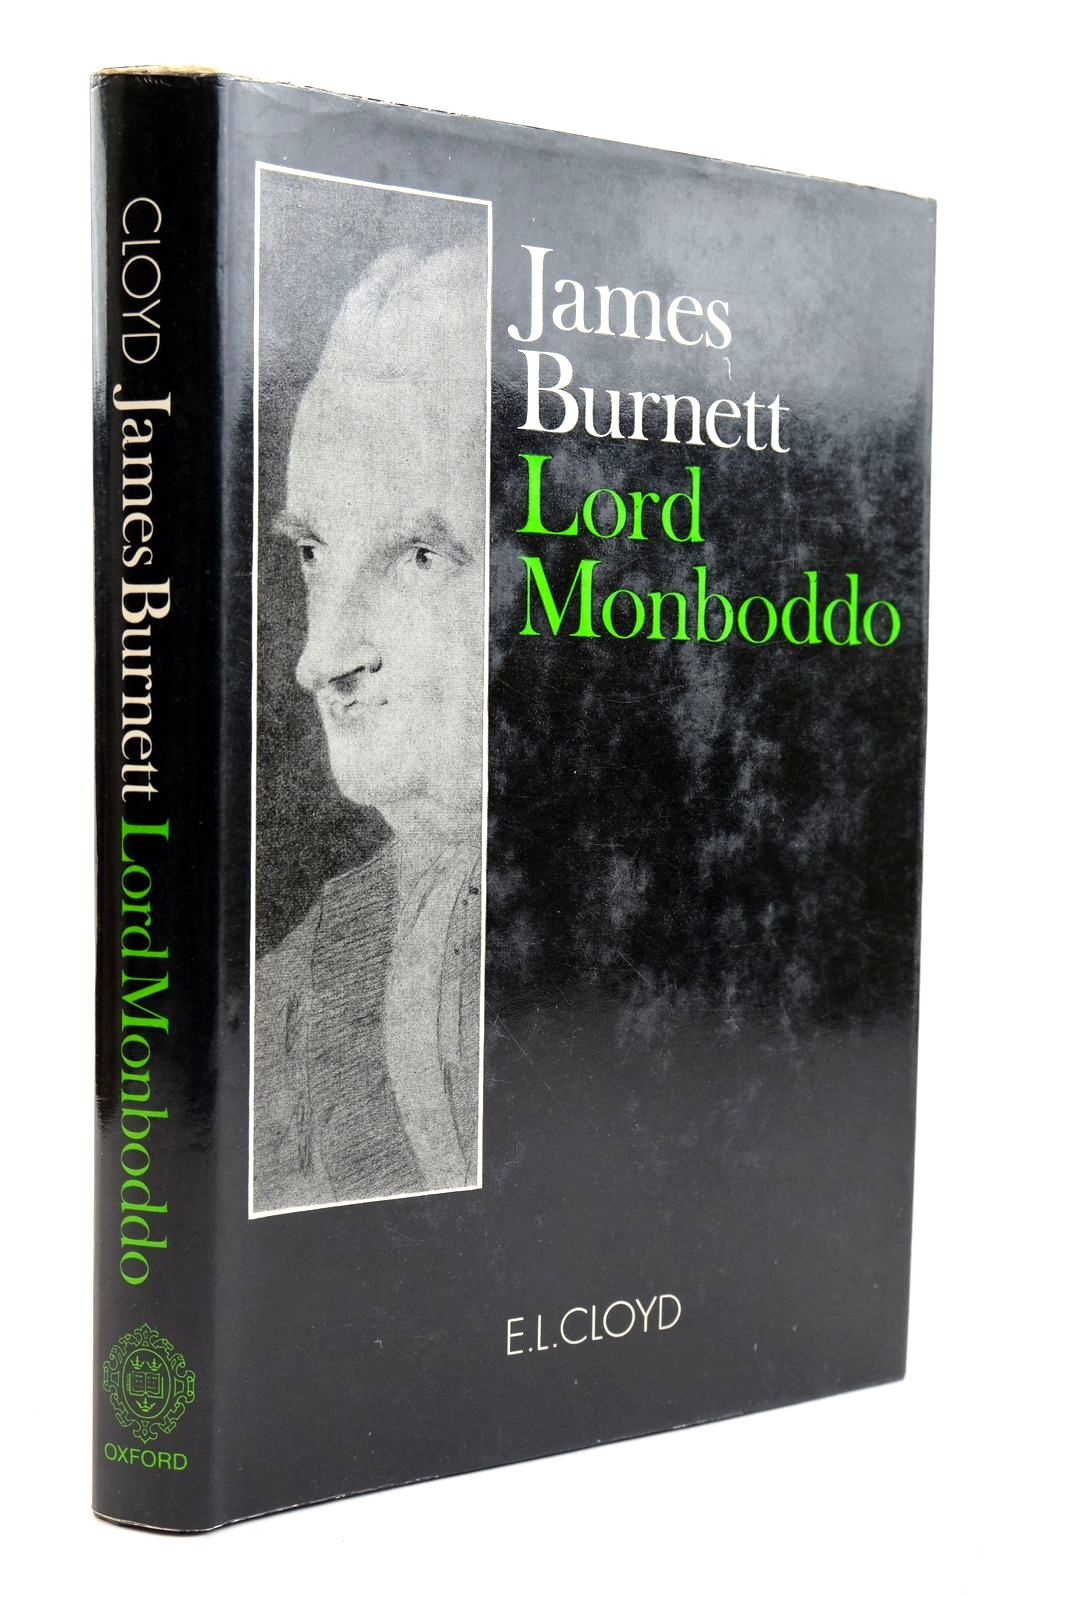 Photo of JAMES BURNETT LORD MONBODDO- Stock Number: 2132941